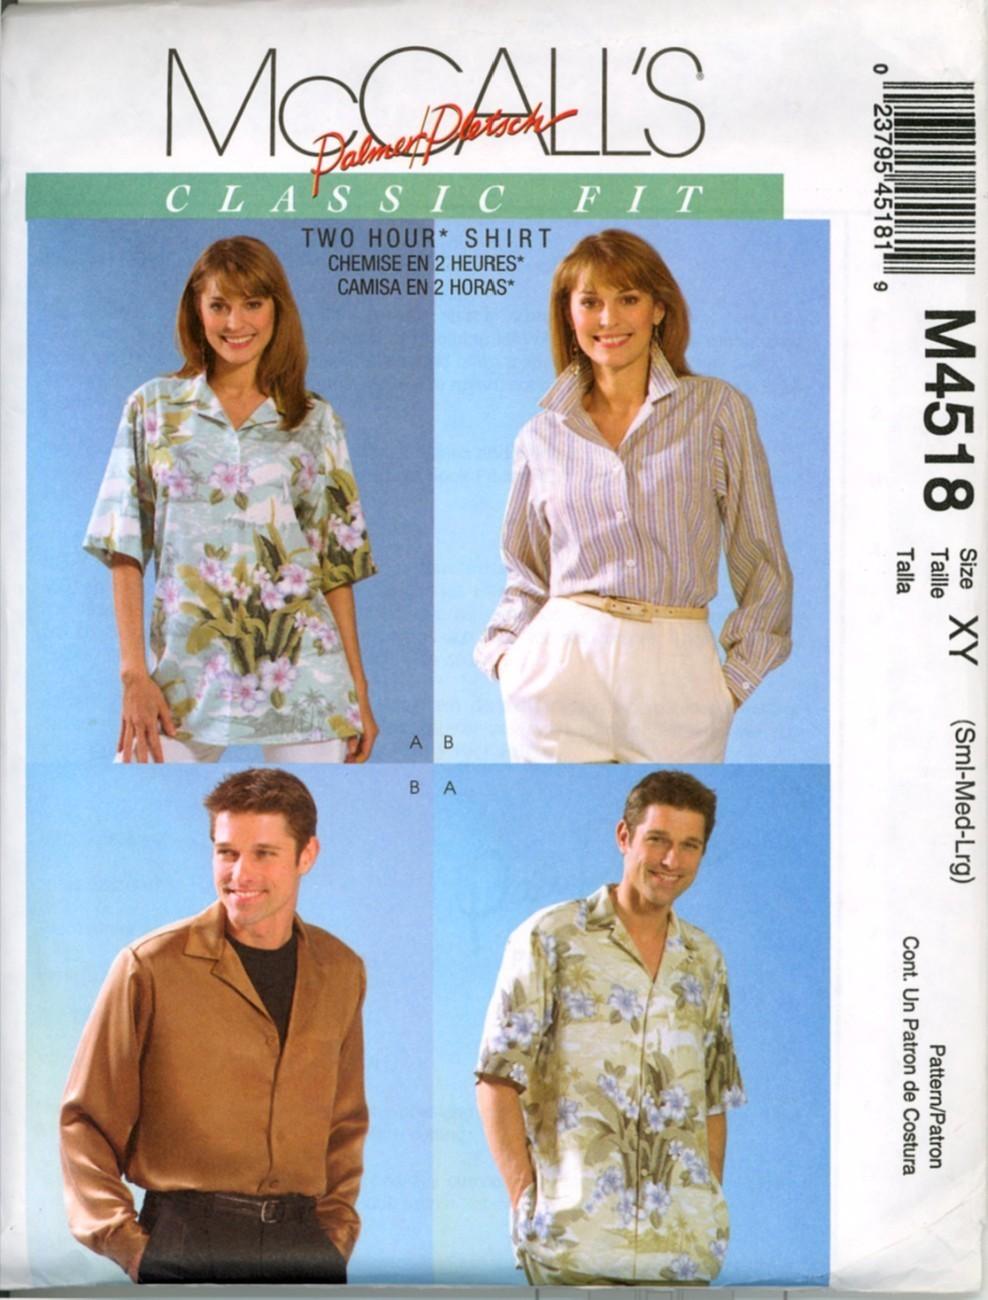 Auction 942 m 4518 hawaiian sml 2004 unc